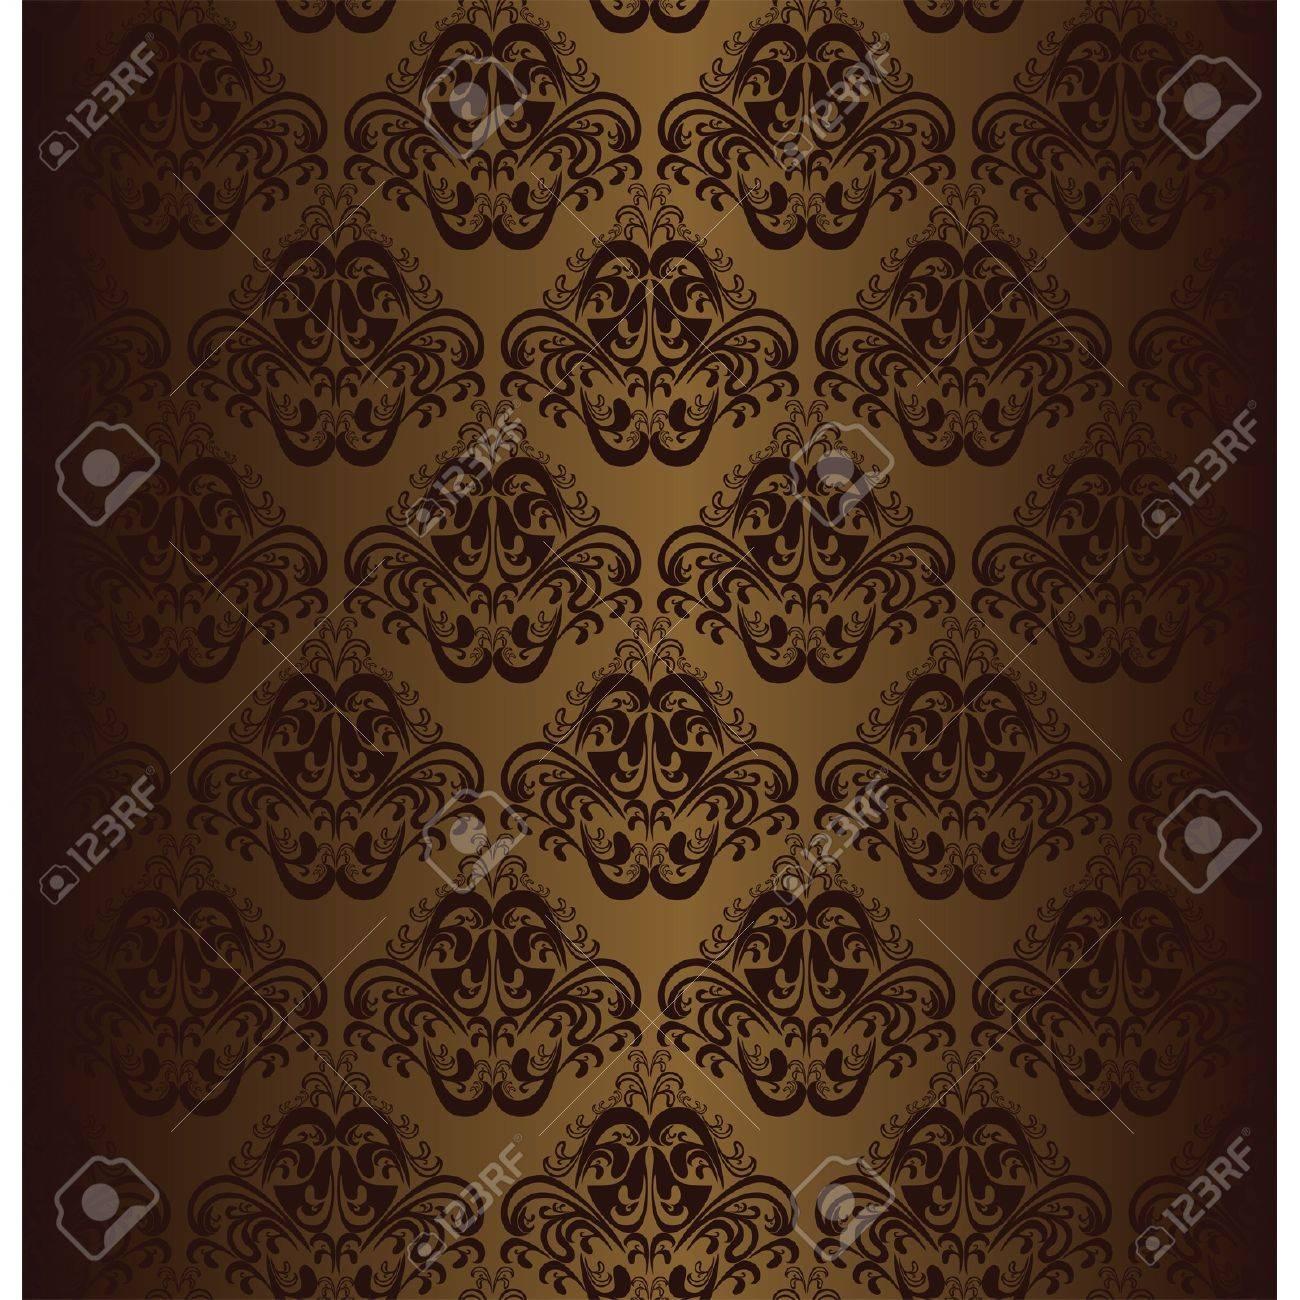 Brown seamless wallpaper. - 16662166